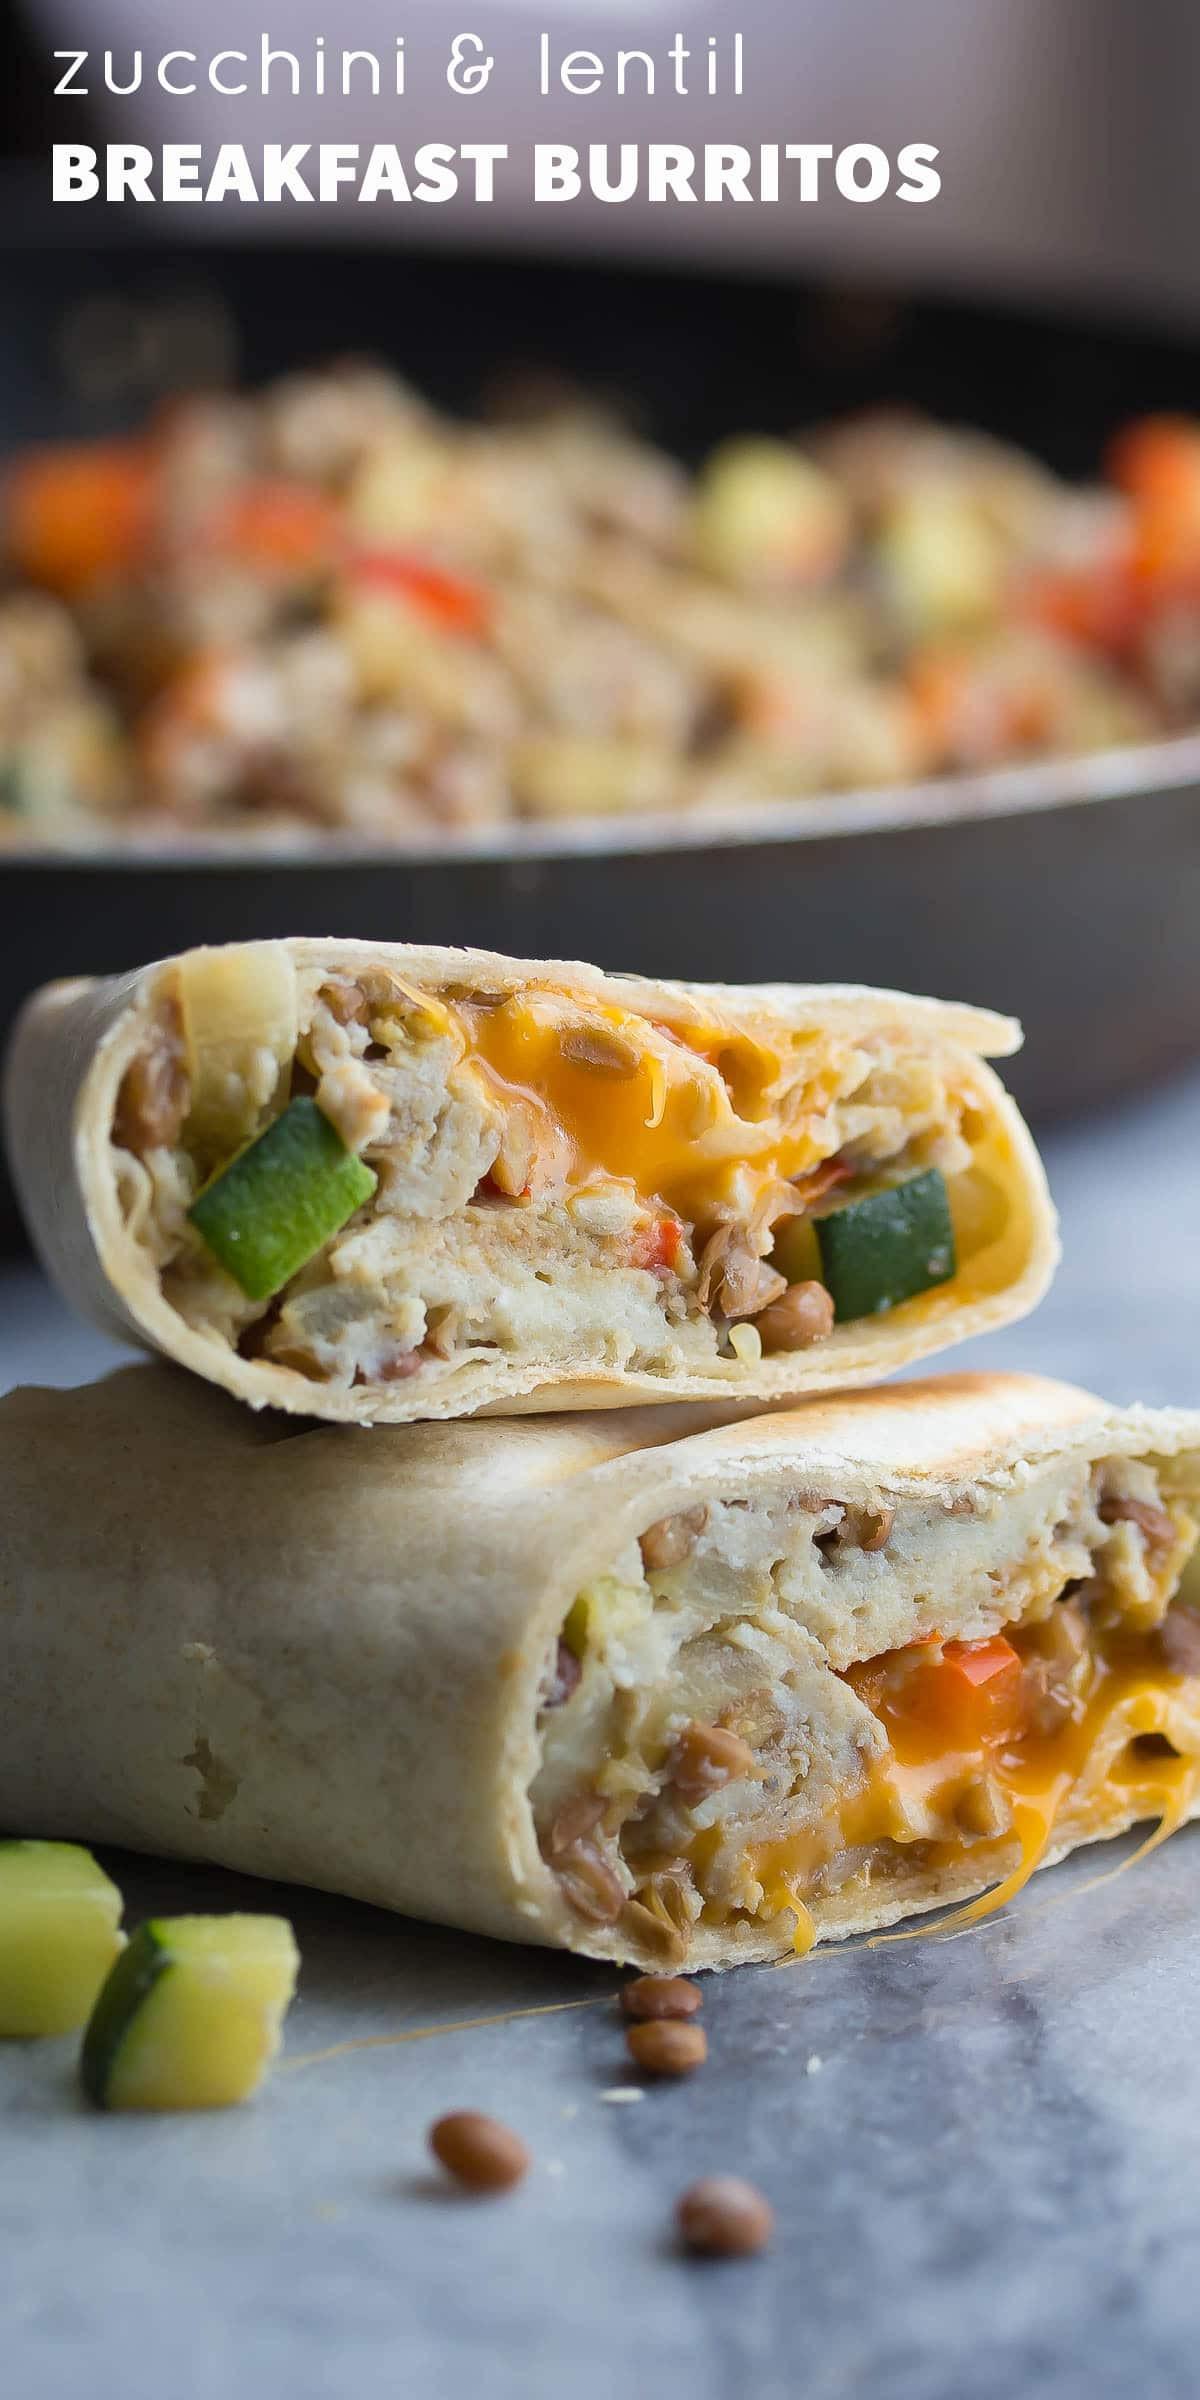 Healthy Frozen Breakfast Burritos  Healthy Breakfast Burritos with Zucchini and Lentils